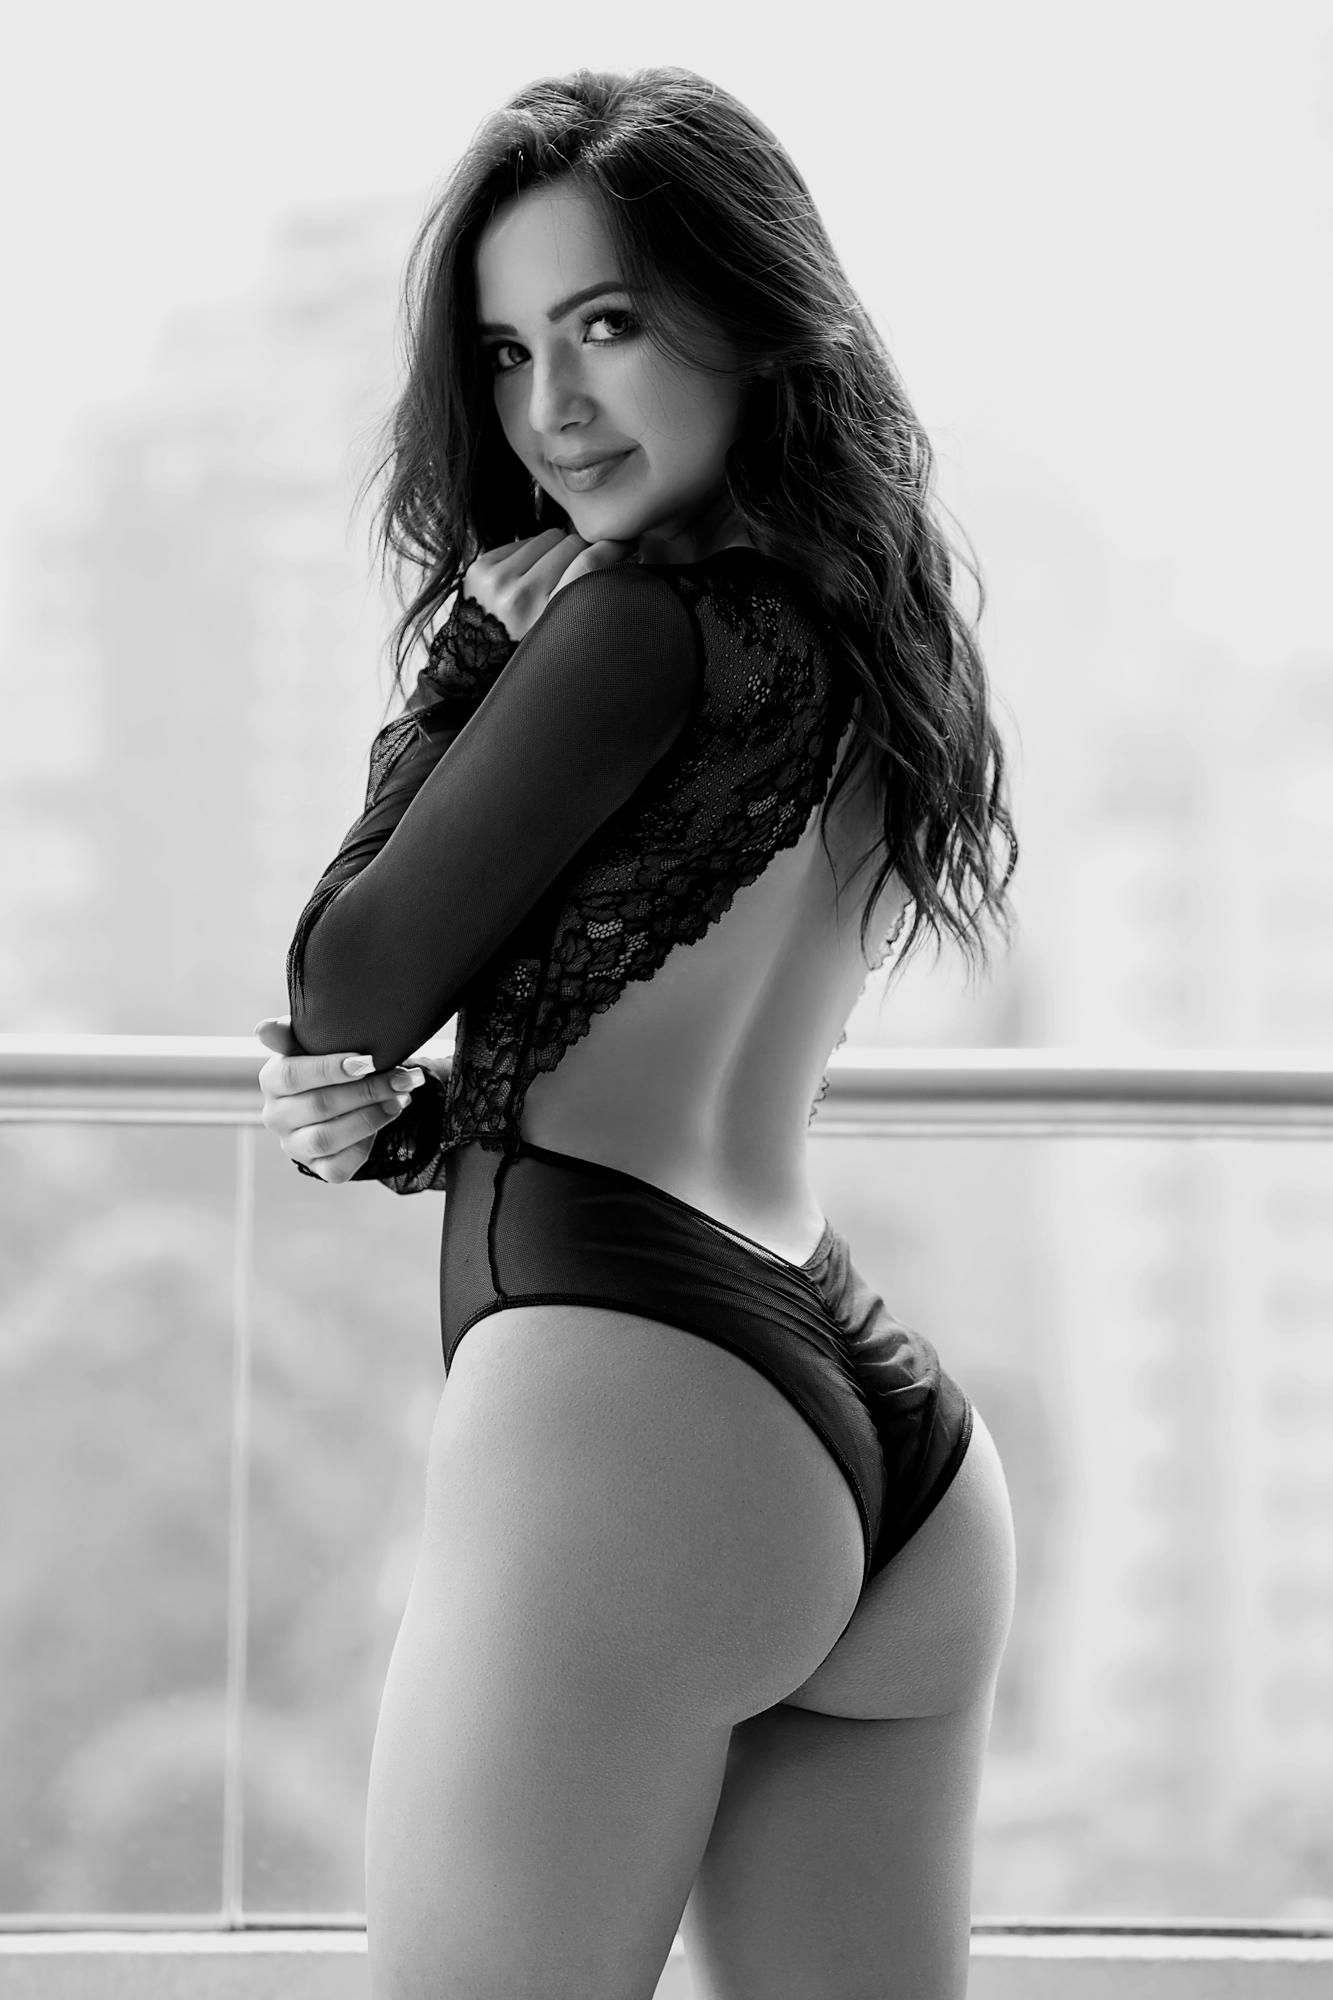 Anabel Ramirez